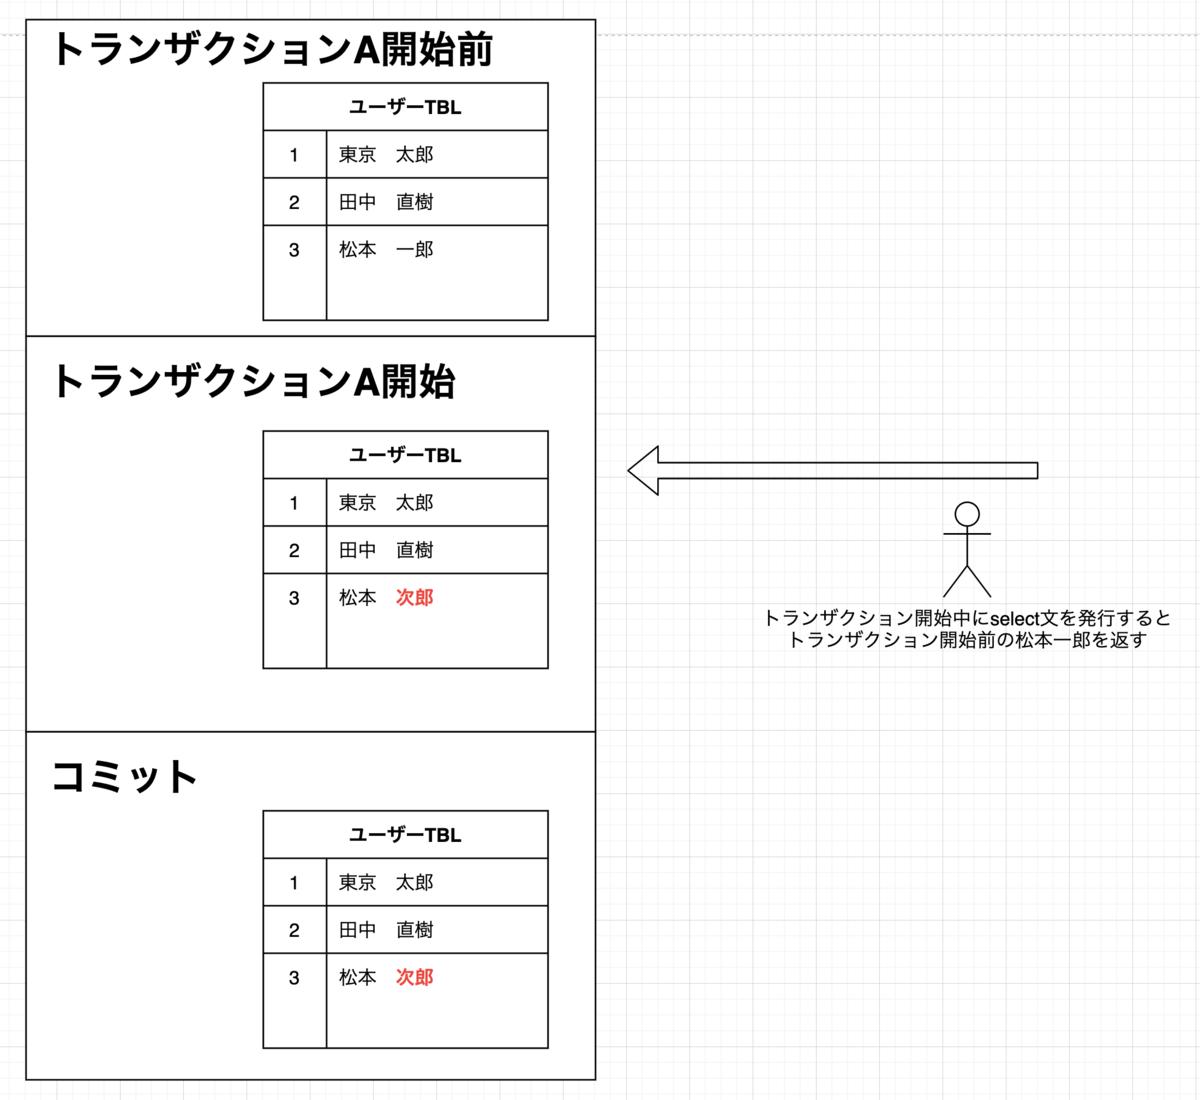 f:id:excite-naka-sho:20210513222720p:plain